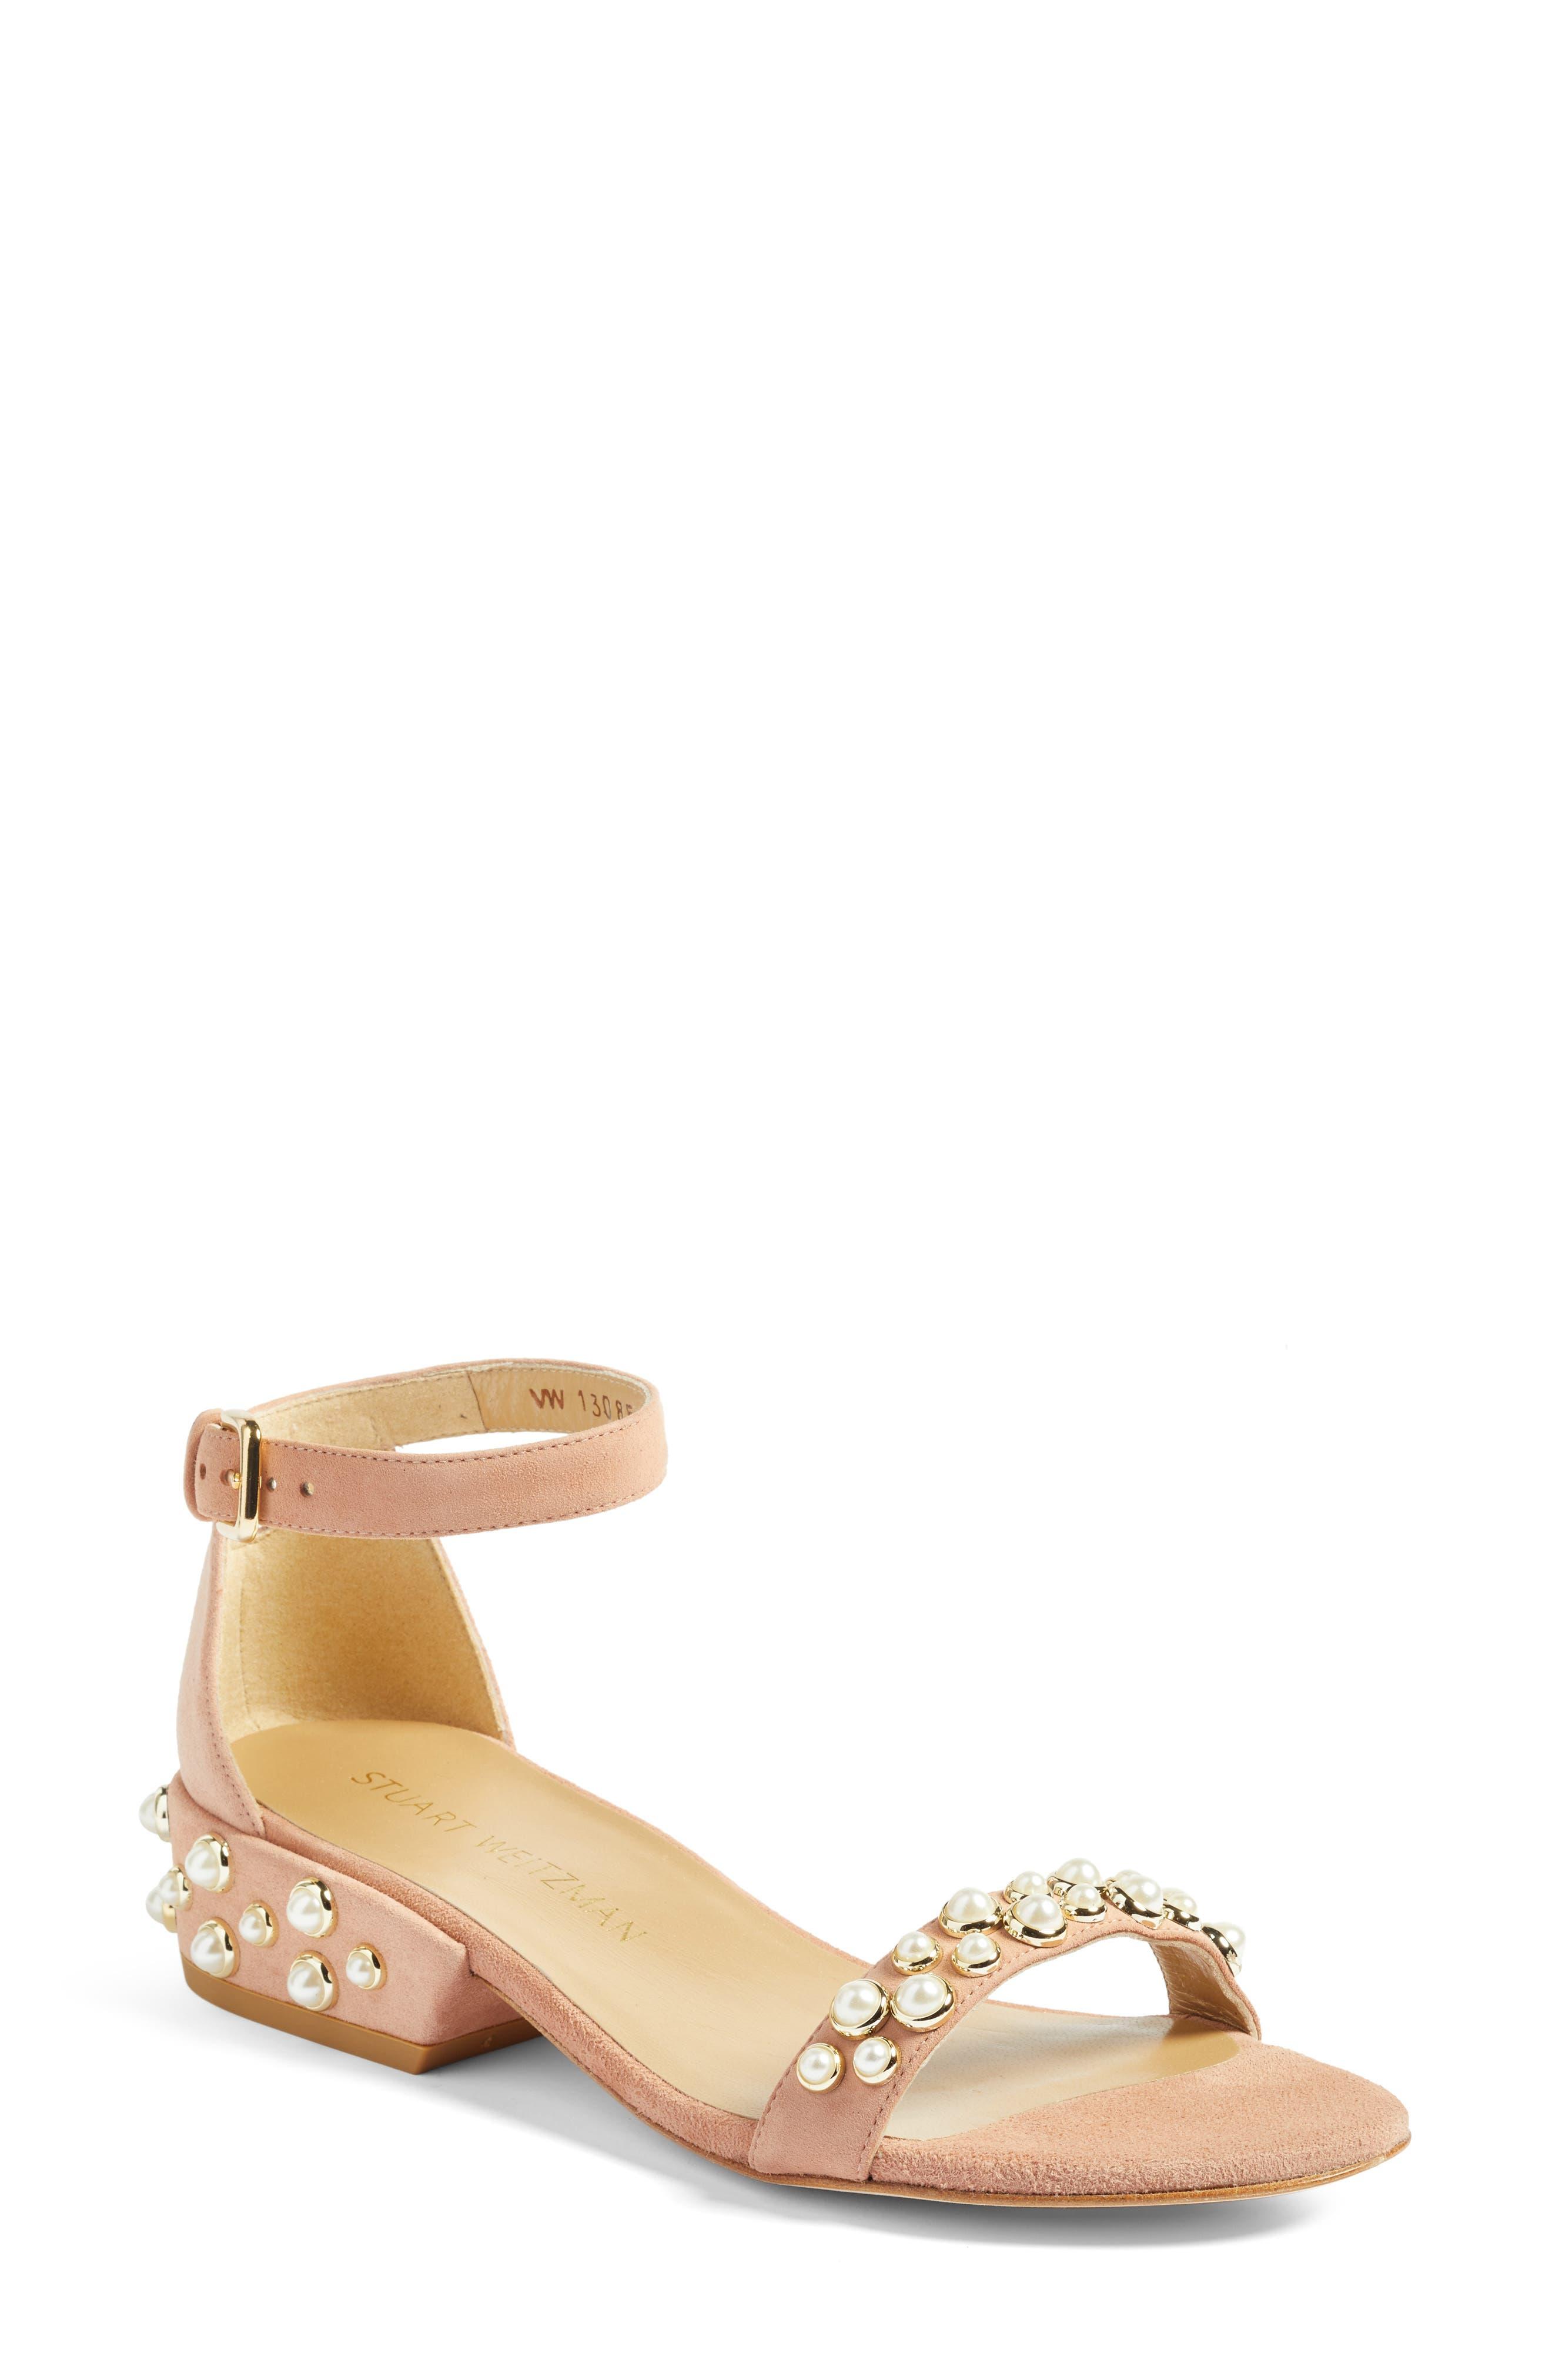 Allpearls Ankle Strap Sandal,                         Main,                         color, 200